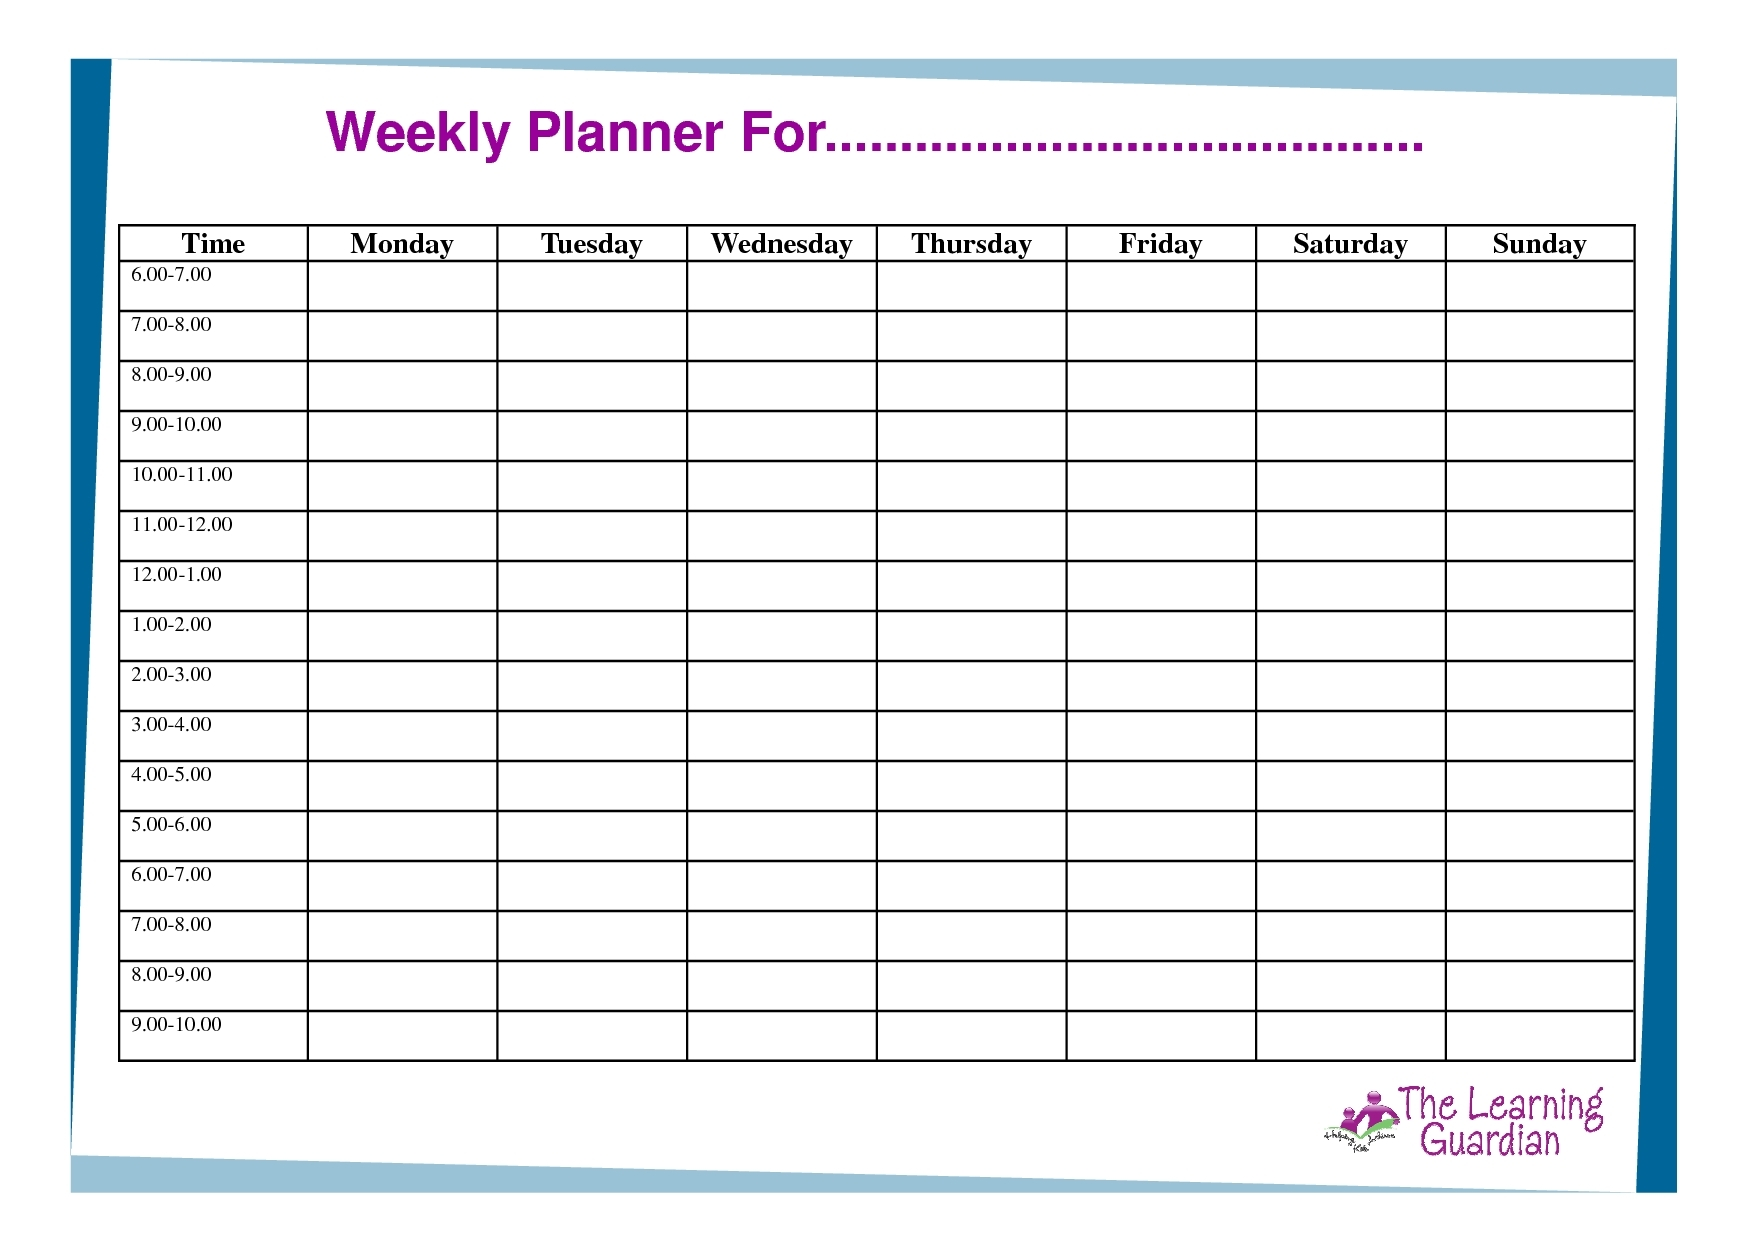 Blank 7-Day Calendar With Time | Template Calendar Printable within Blank 7-Day Calendar With Time